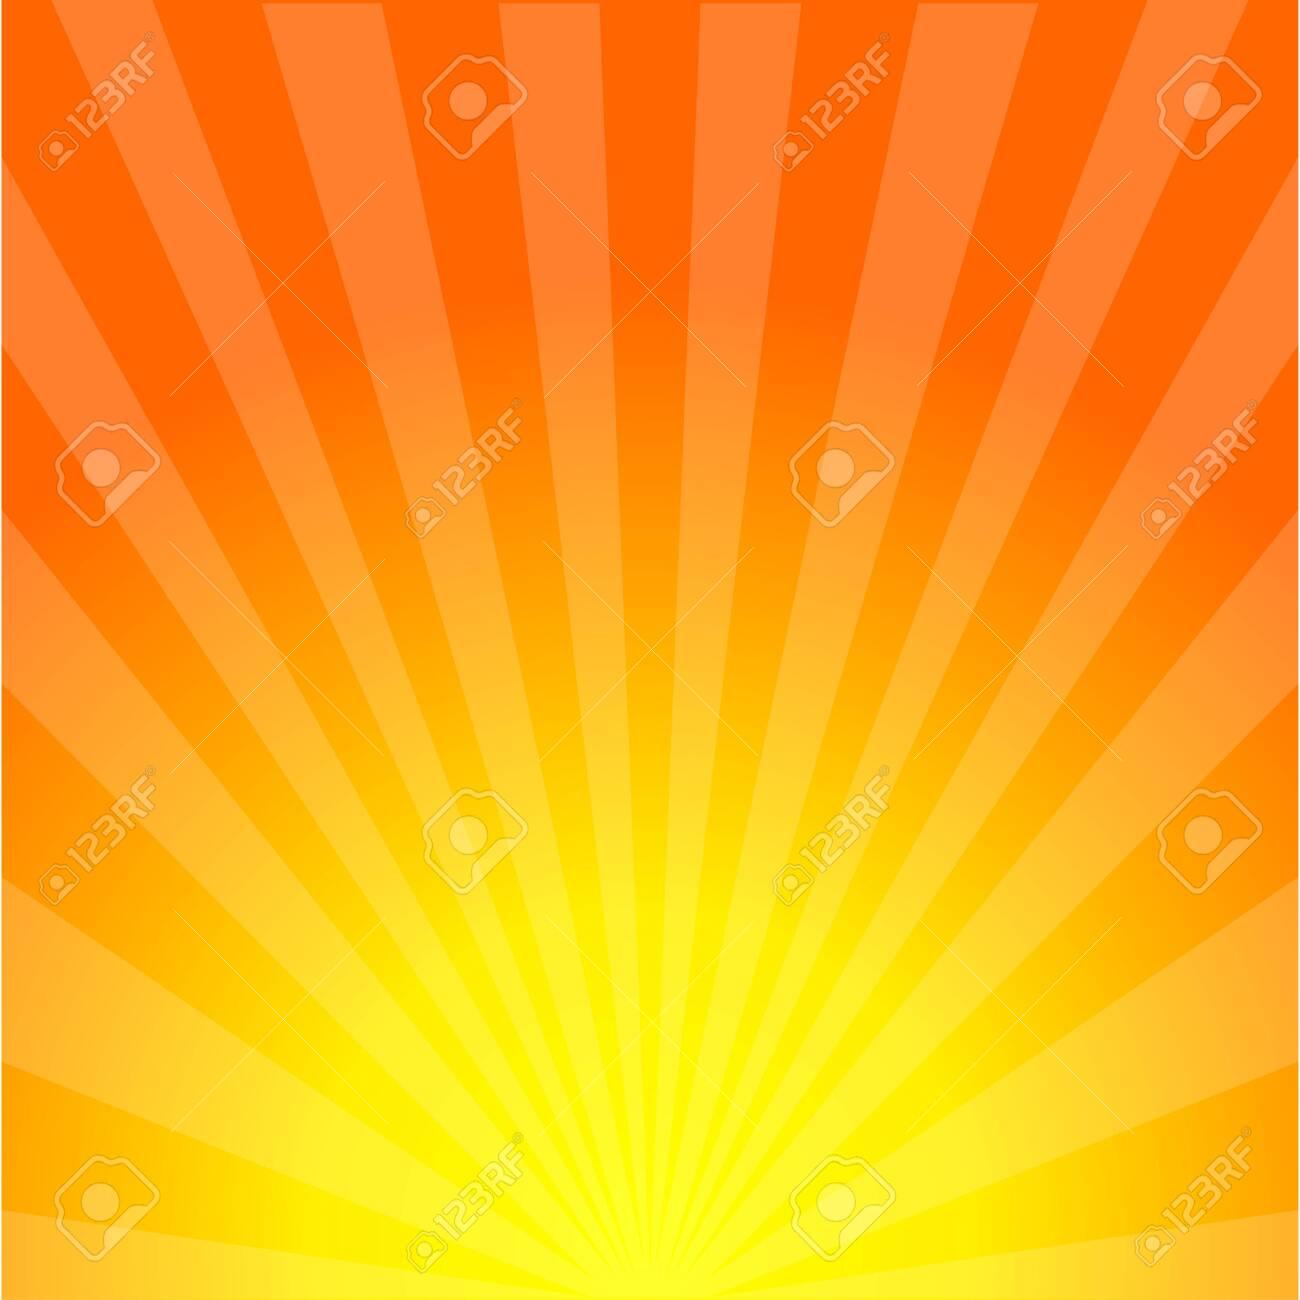 Sun rays background. Sunburst. Sunshine. Sunset. Summer sun. Sunrise. Eps10 - 124142721